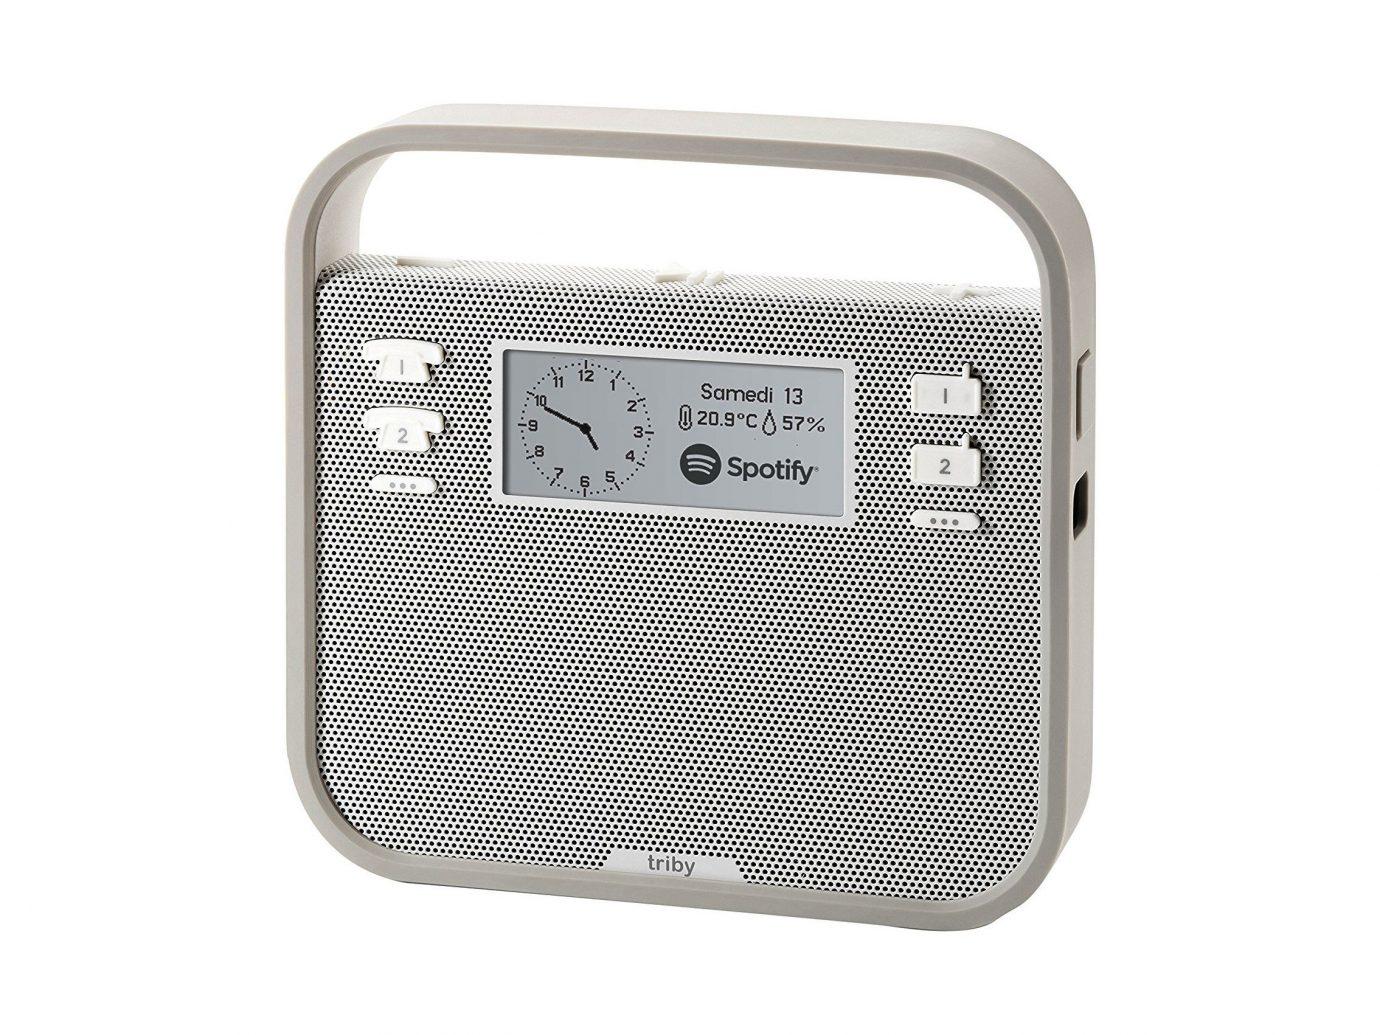 Travel Shop product product design electronics rectangle clock radio